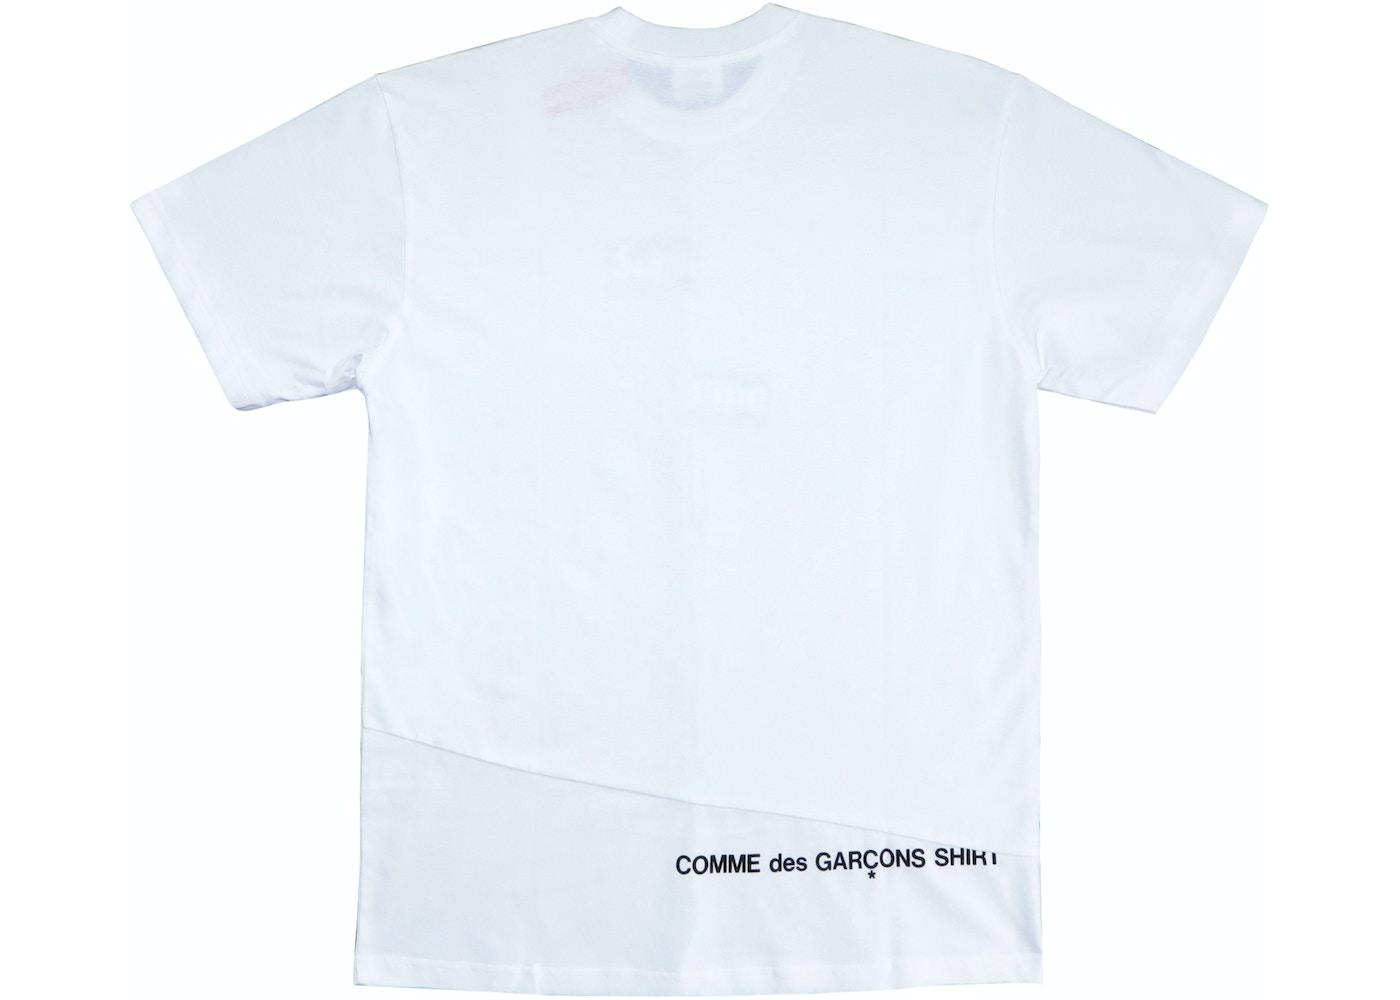 855e0be9d6c6 Supreme Comme des Garcons SHIRT Split Box Logo Tee White - FW18